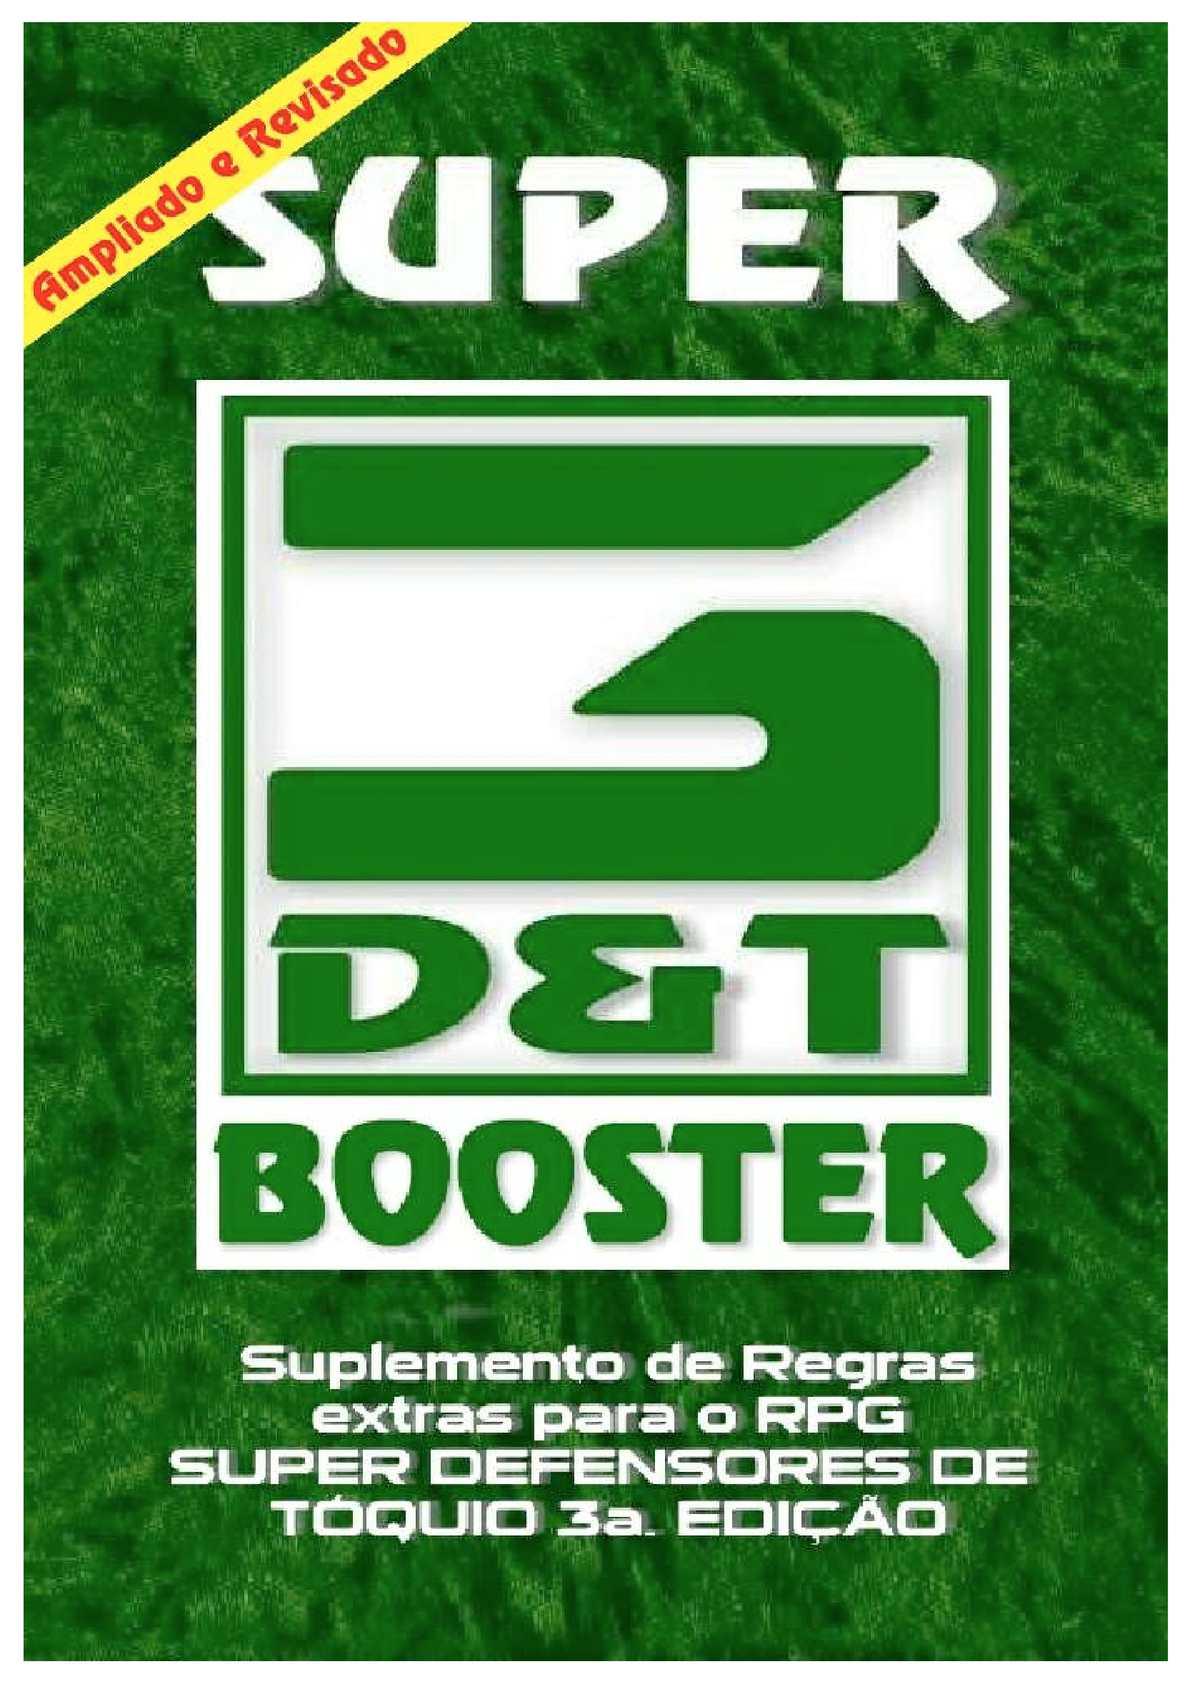 ca1f3dadf Calaméo - Super 3D T Booster Revisado e Ampliado